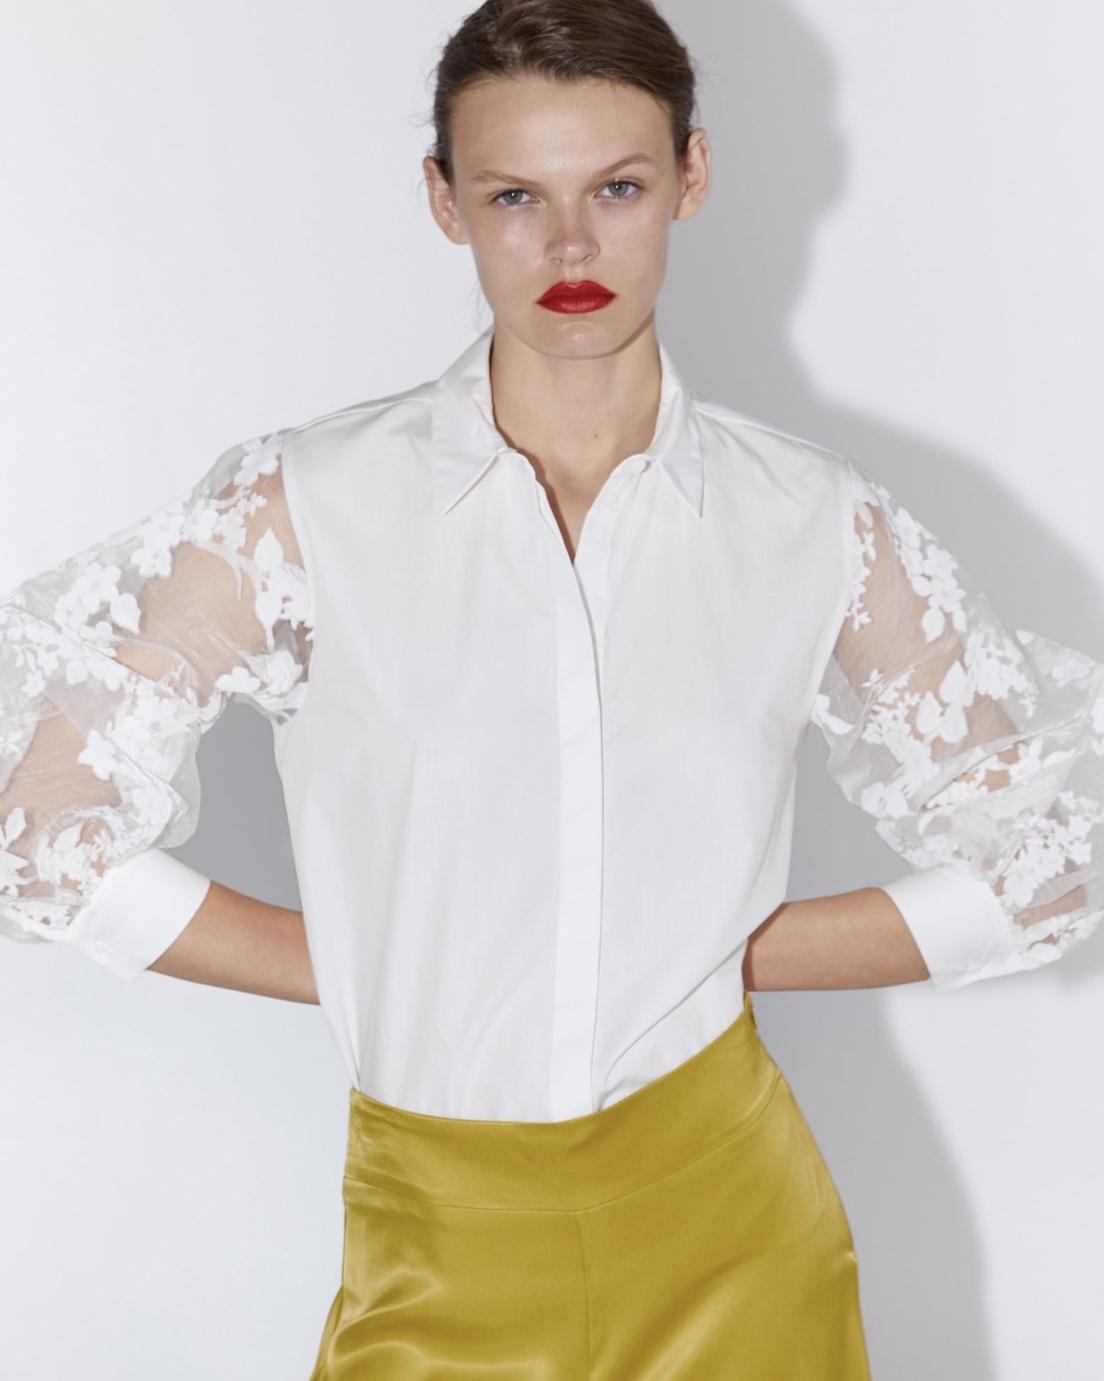 Zara Organza Sleeve Shirt (£25.99)